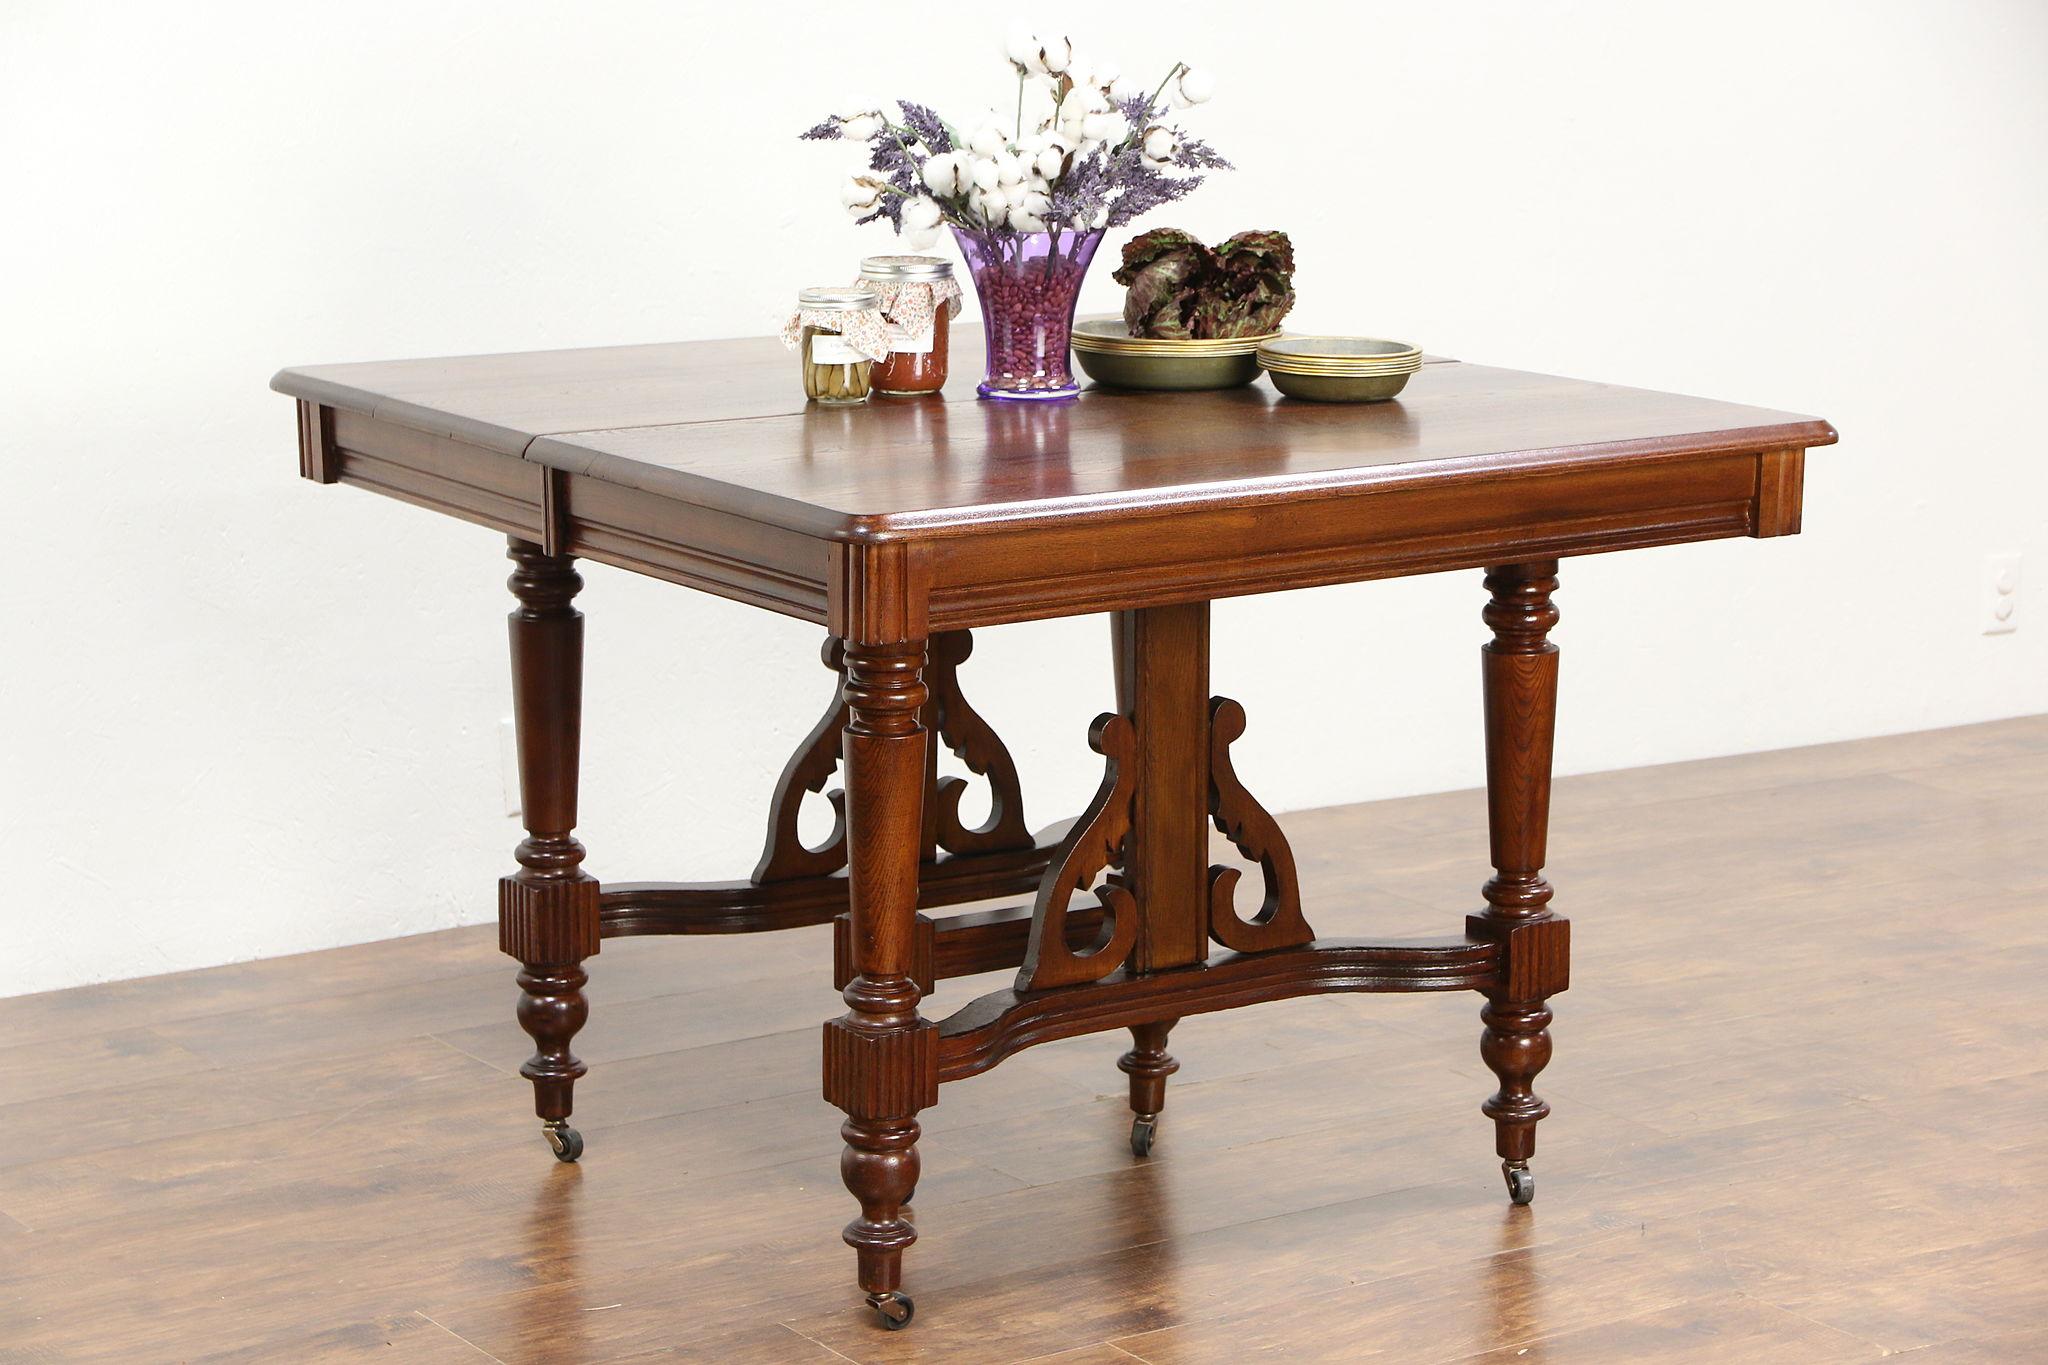 Victorian Eastlake Ash Oak Antique 1900 Square Dining Table 7 Leaves